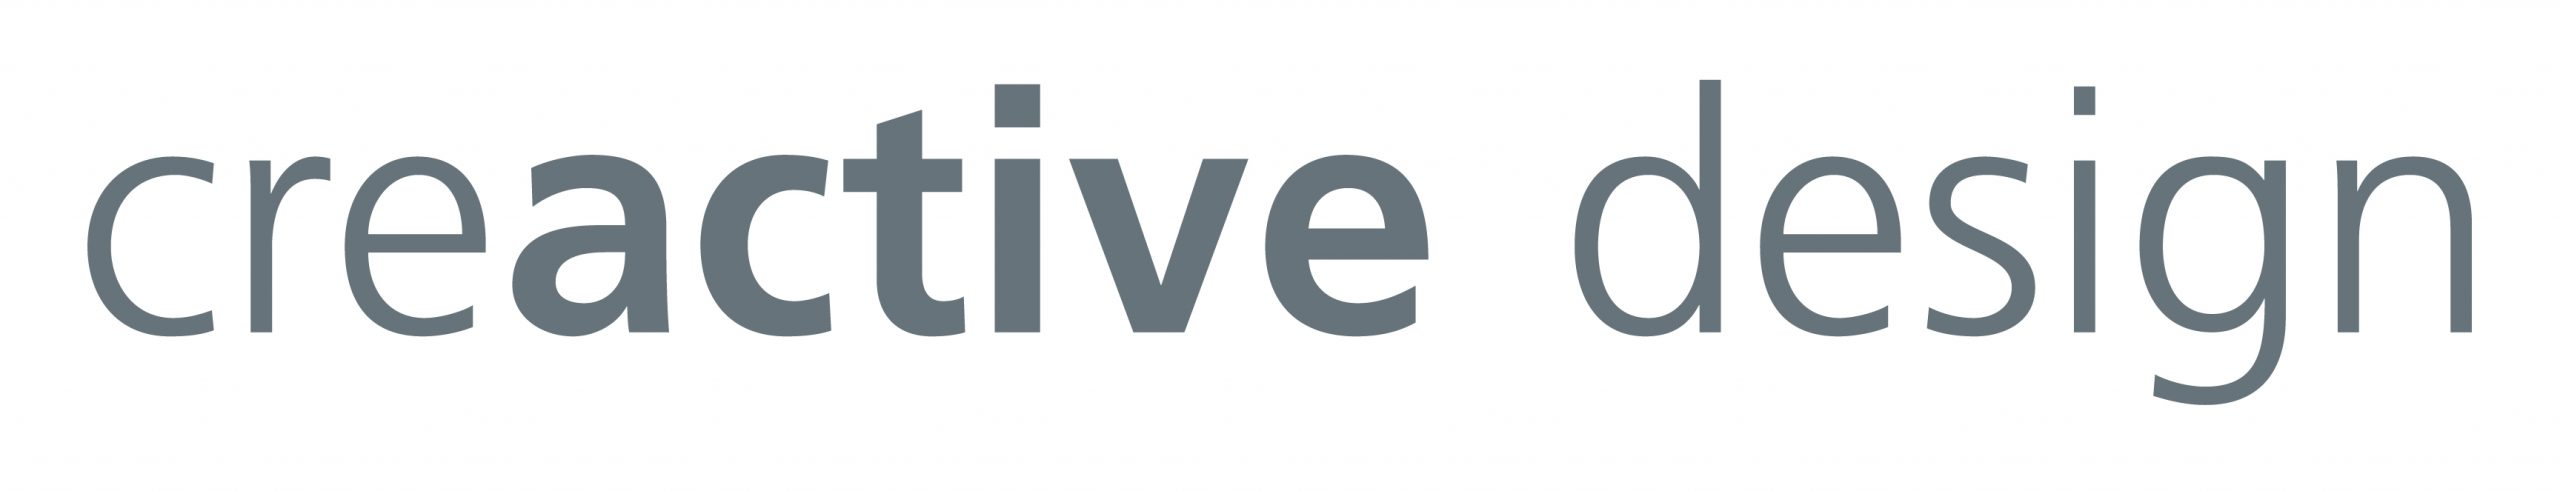 Creactive Design Ltd